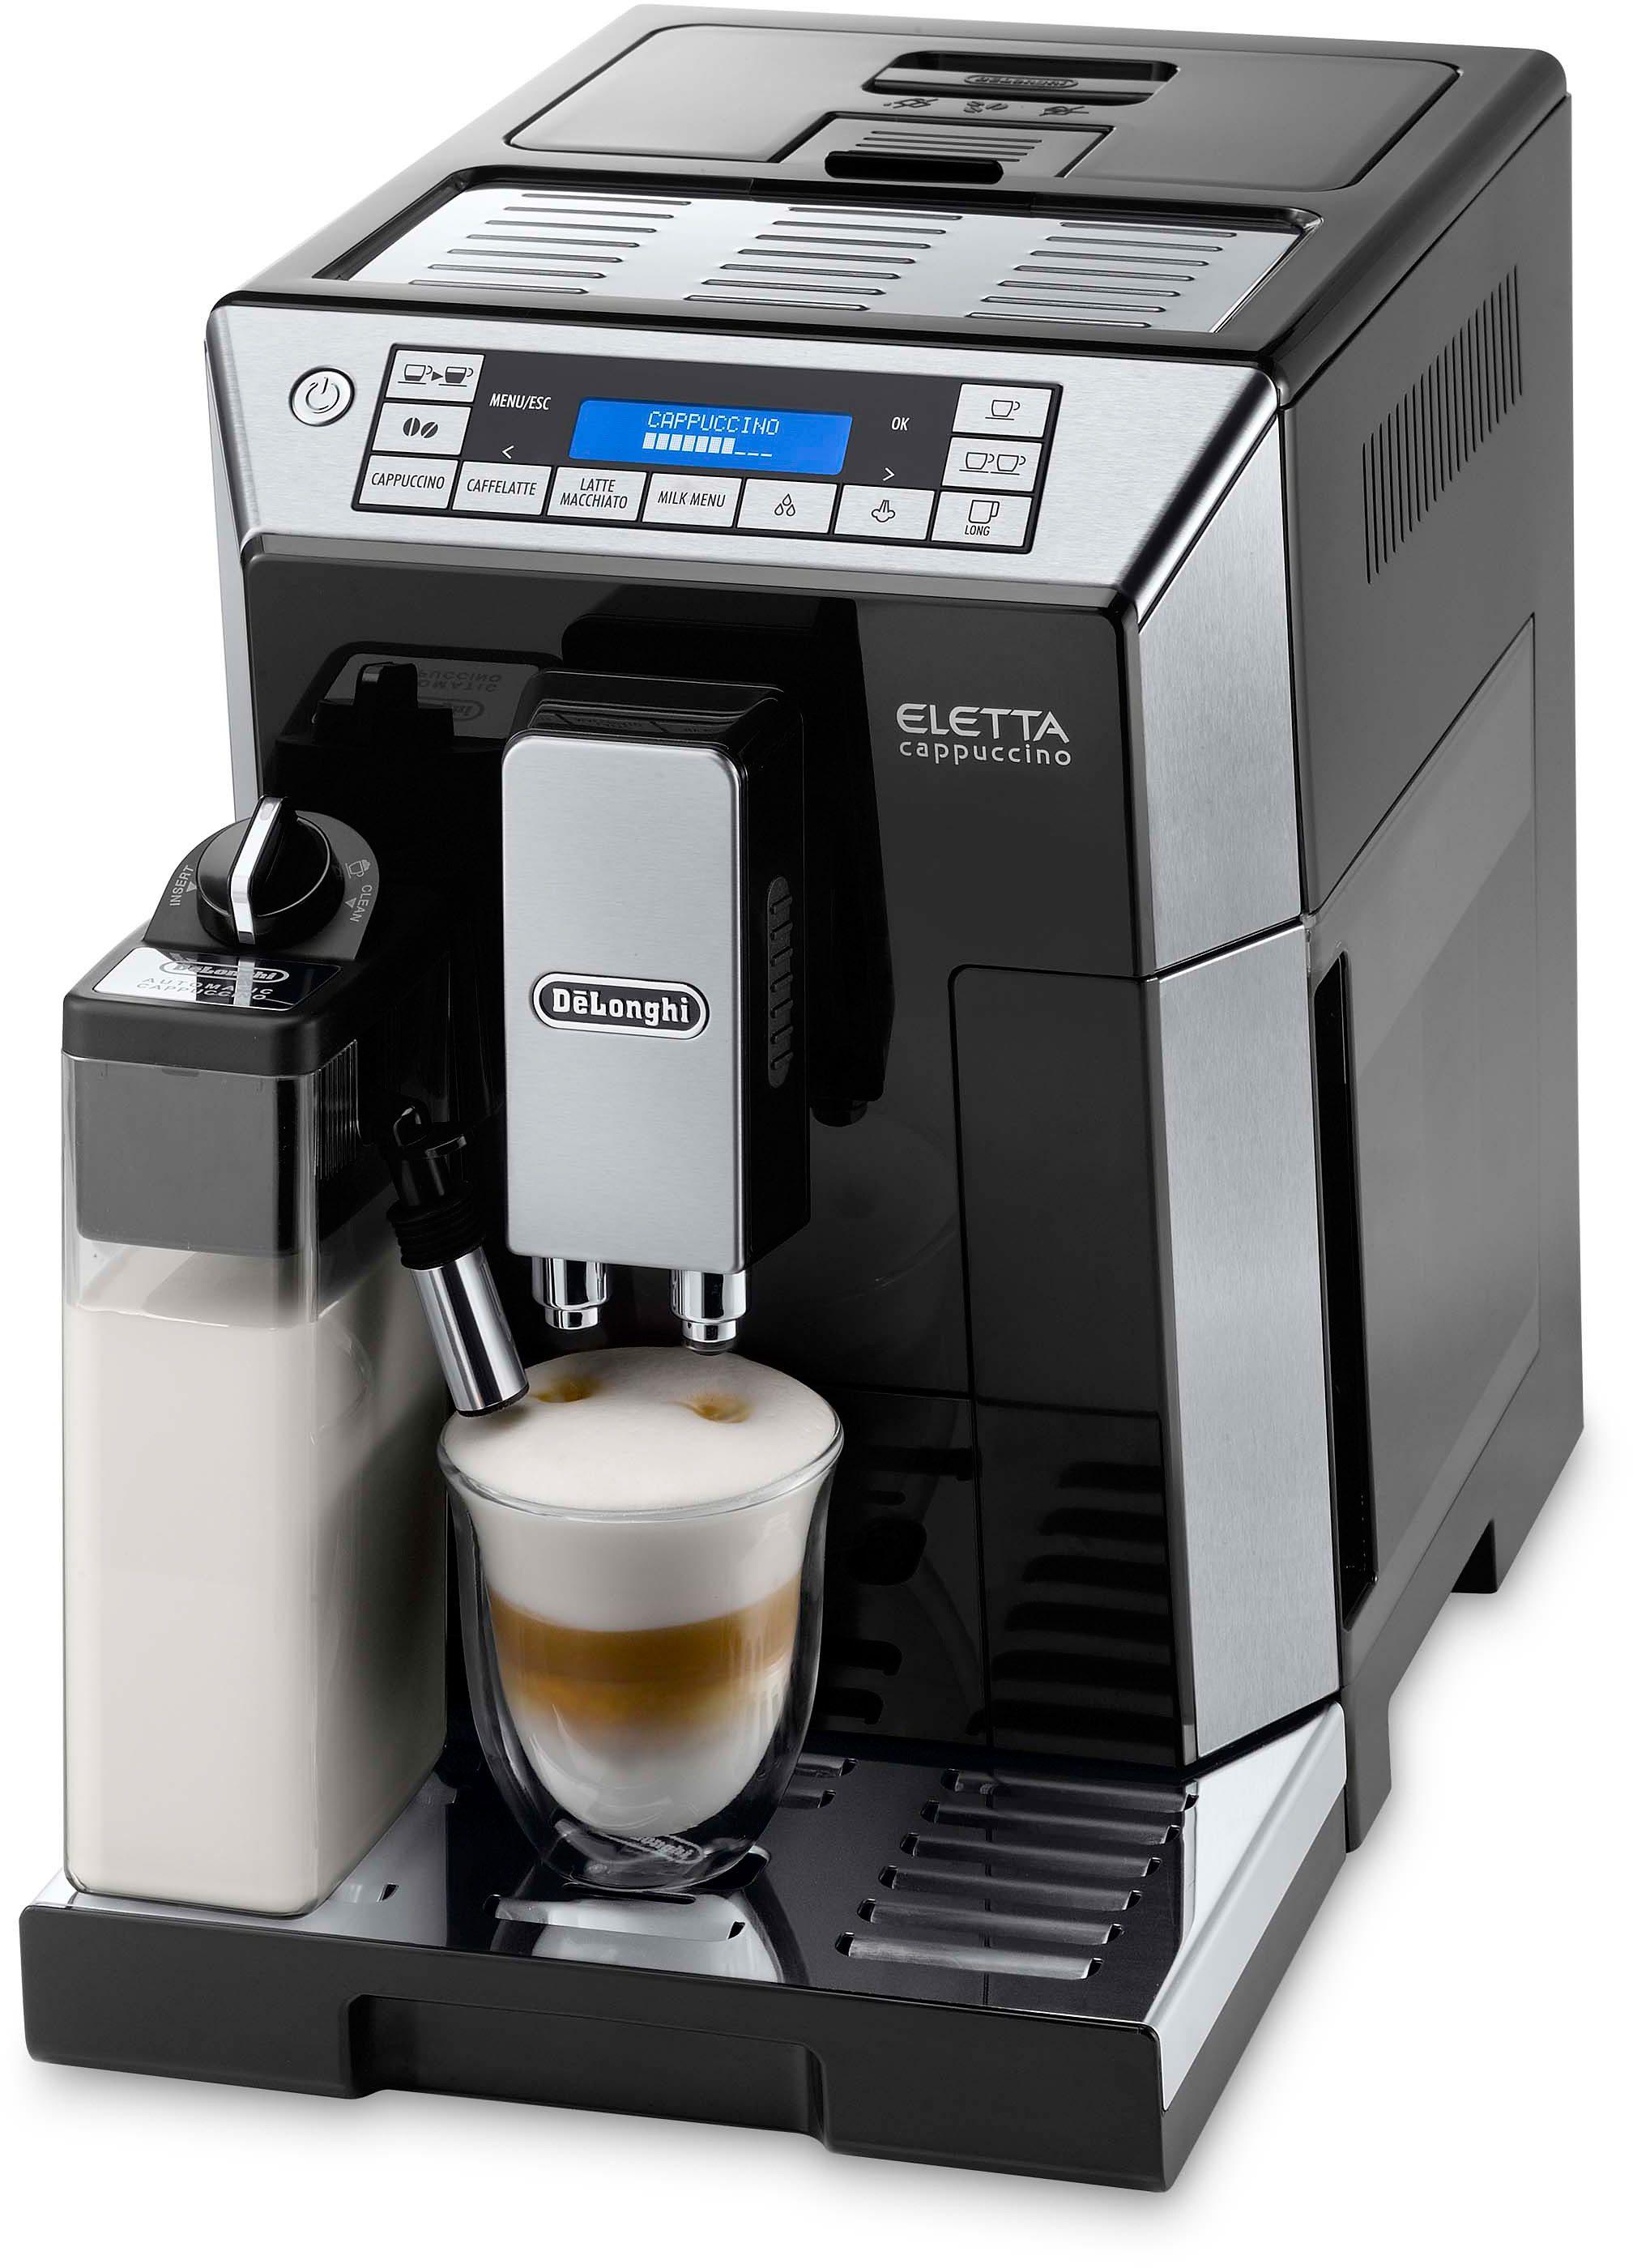 De'Longhi Kaffeevollautomat ECAM 45.766B ELETTA, großer 400 g Bohnenbehälter